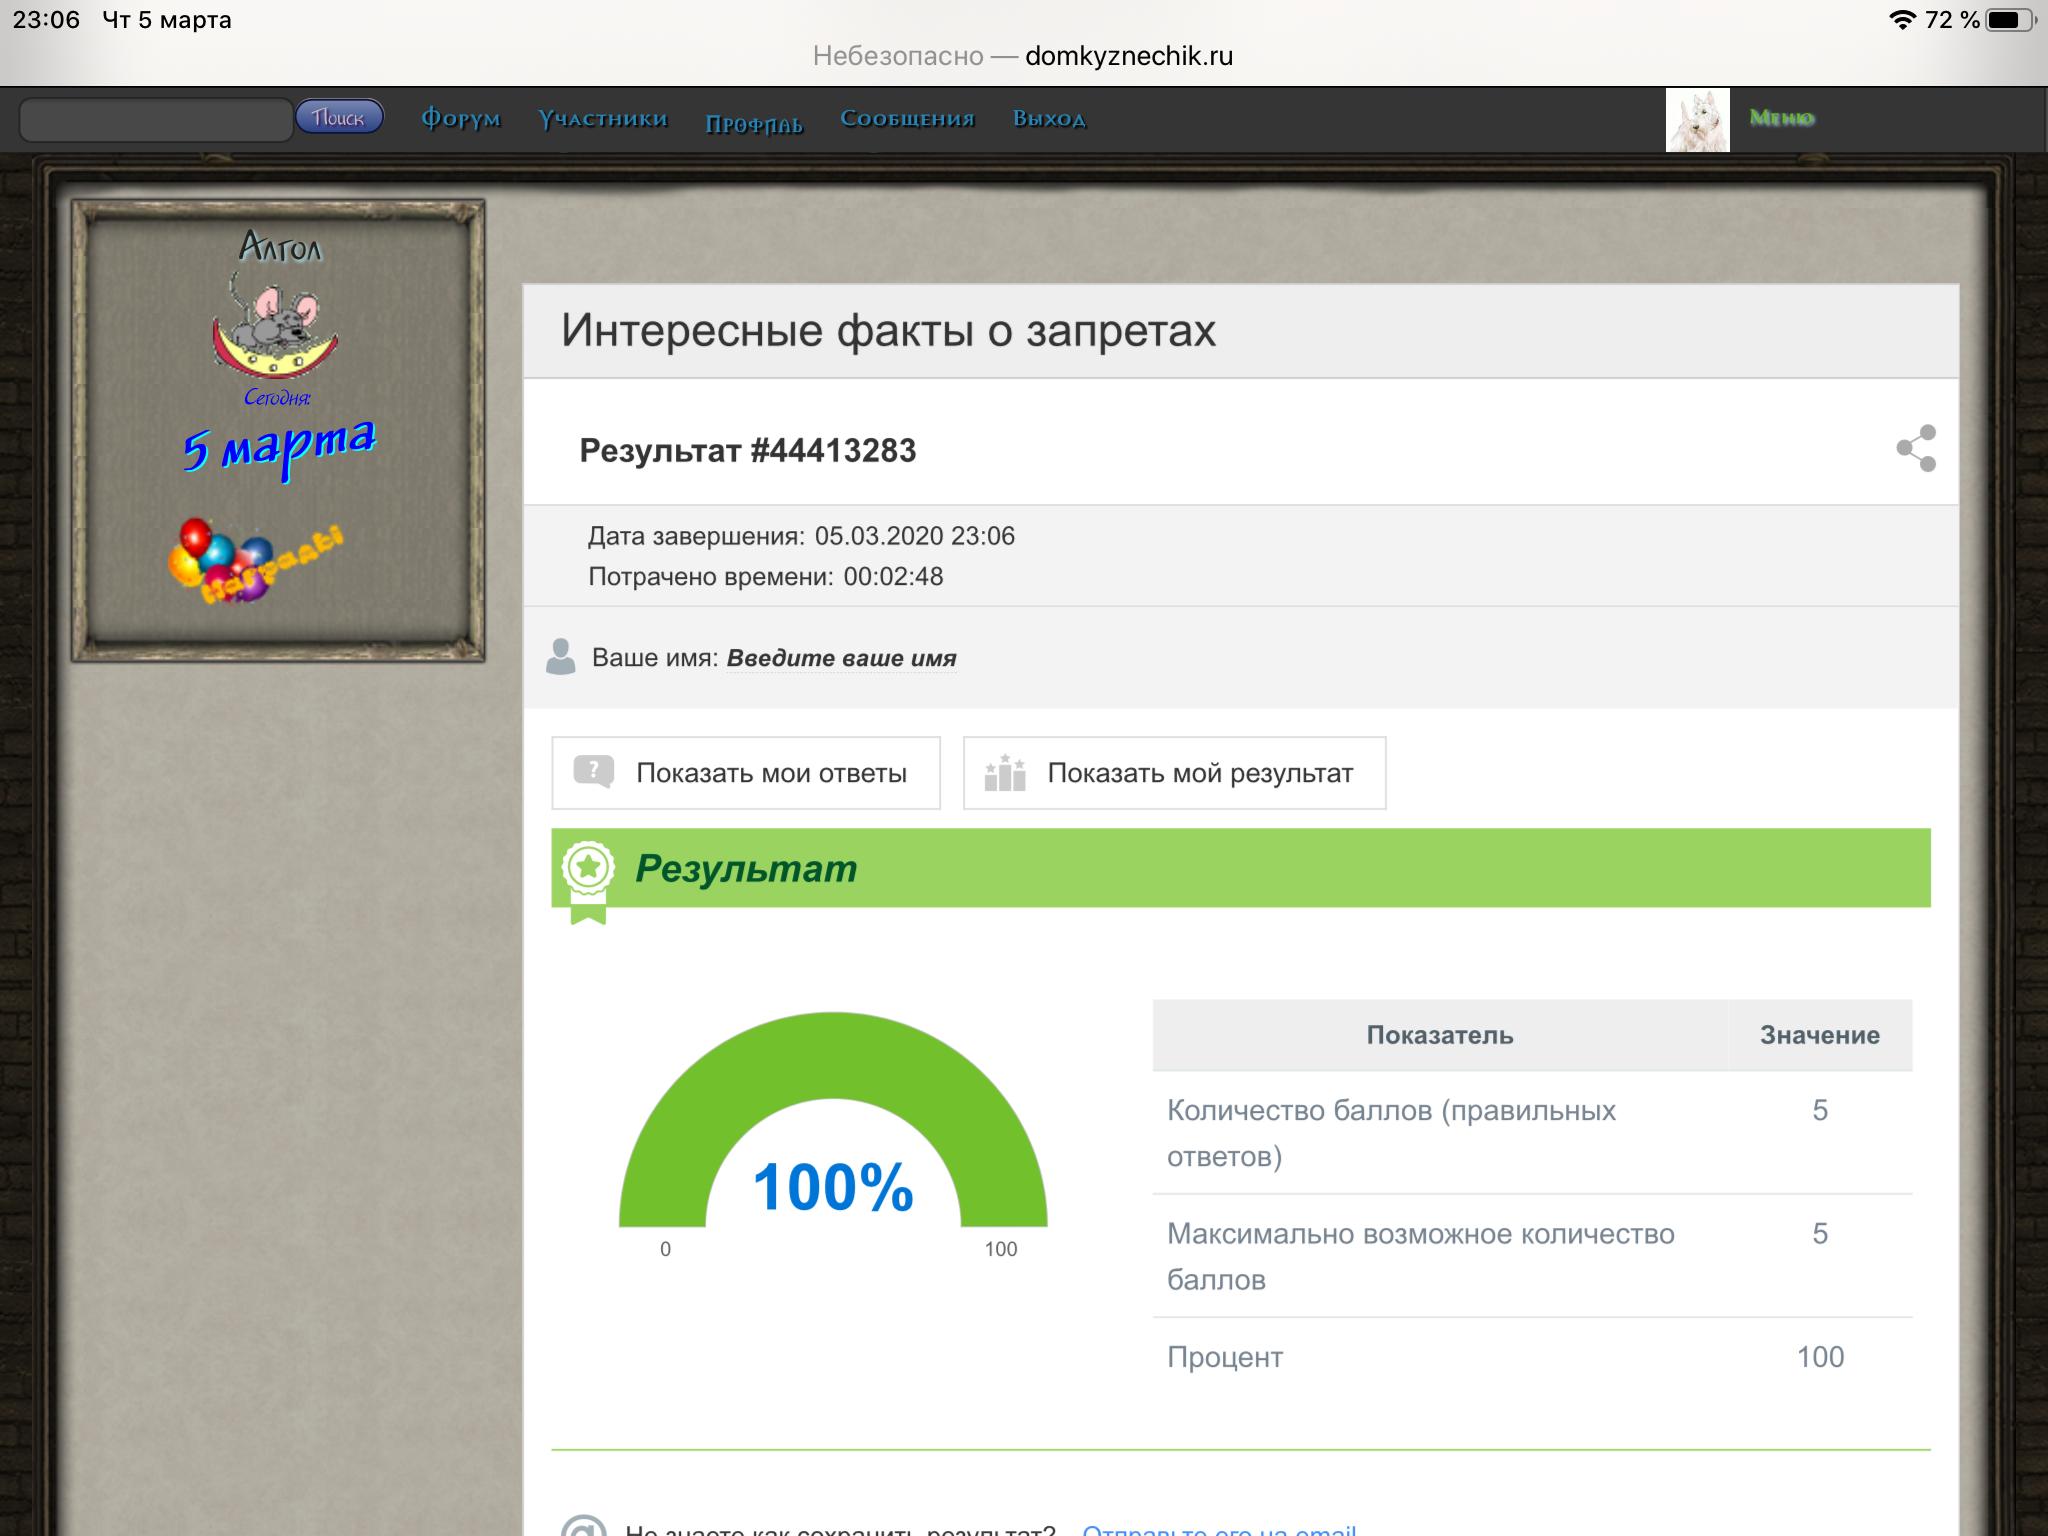 https://i5.imageban.ru/out/2020/03/05/e712315428f3912a920527f791507711.png